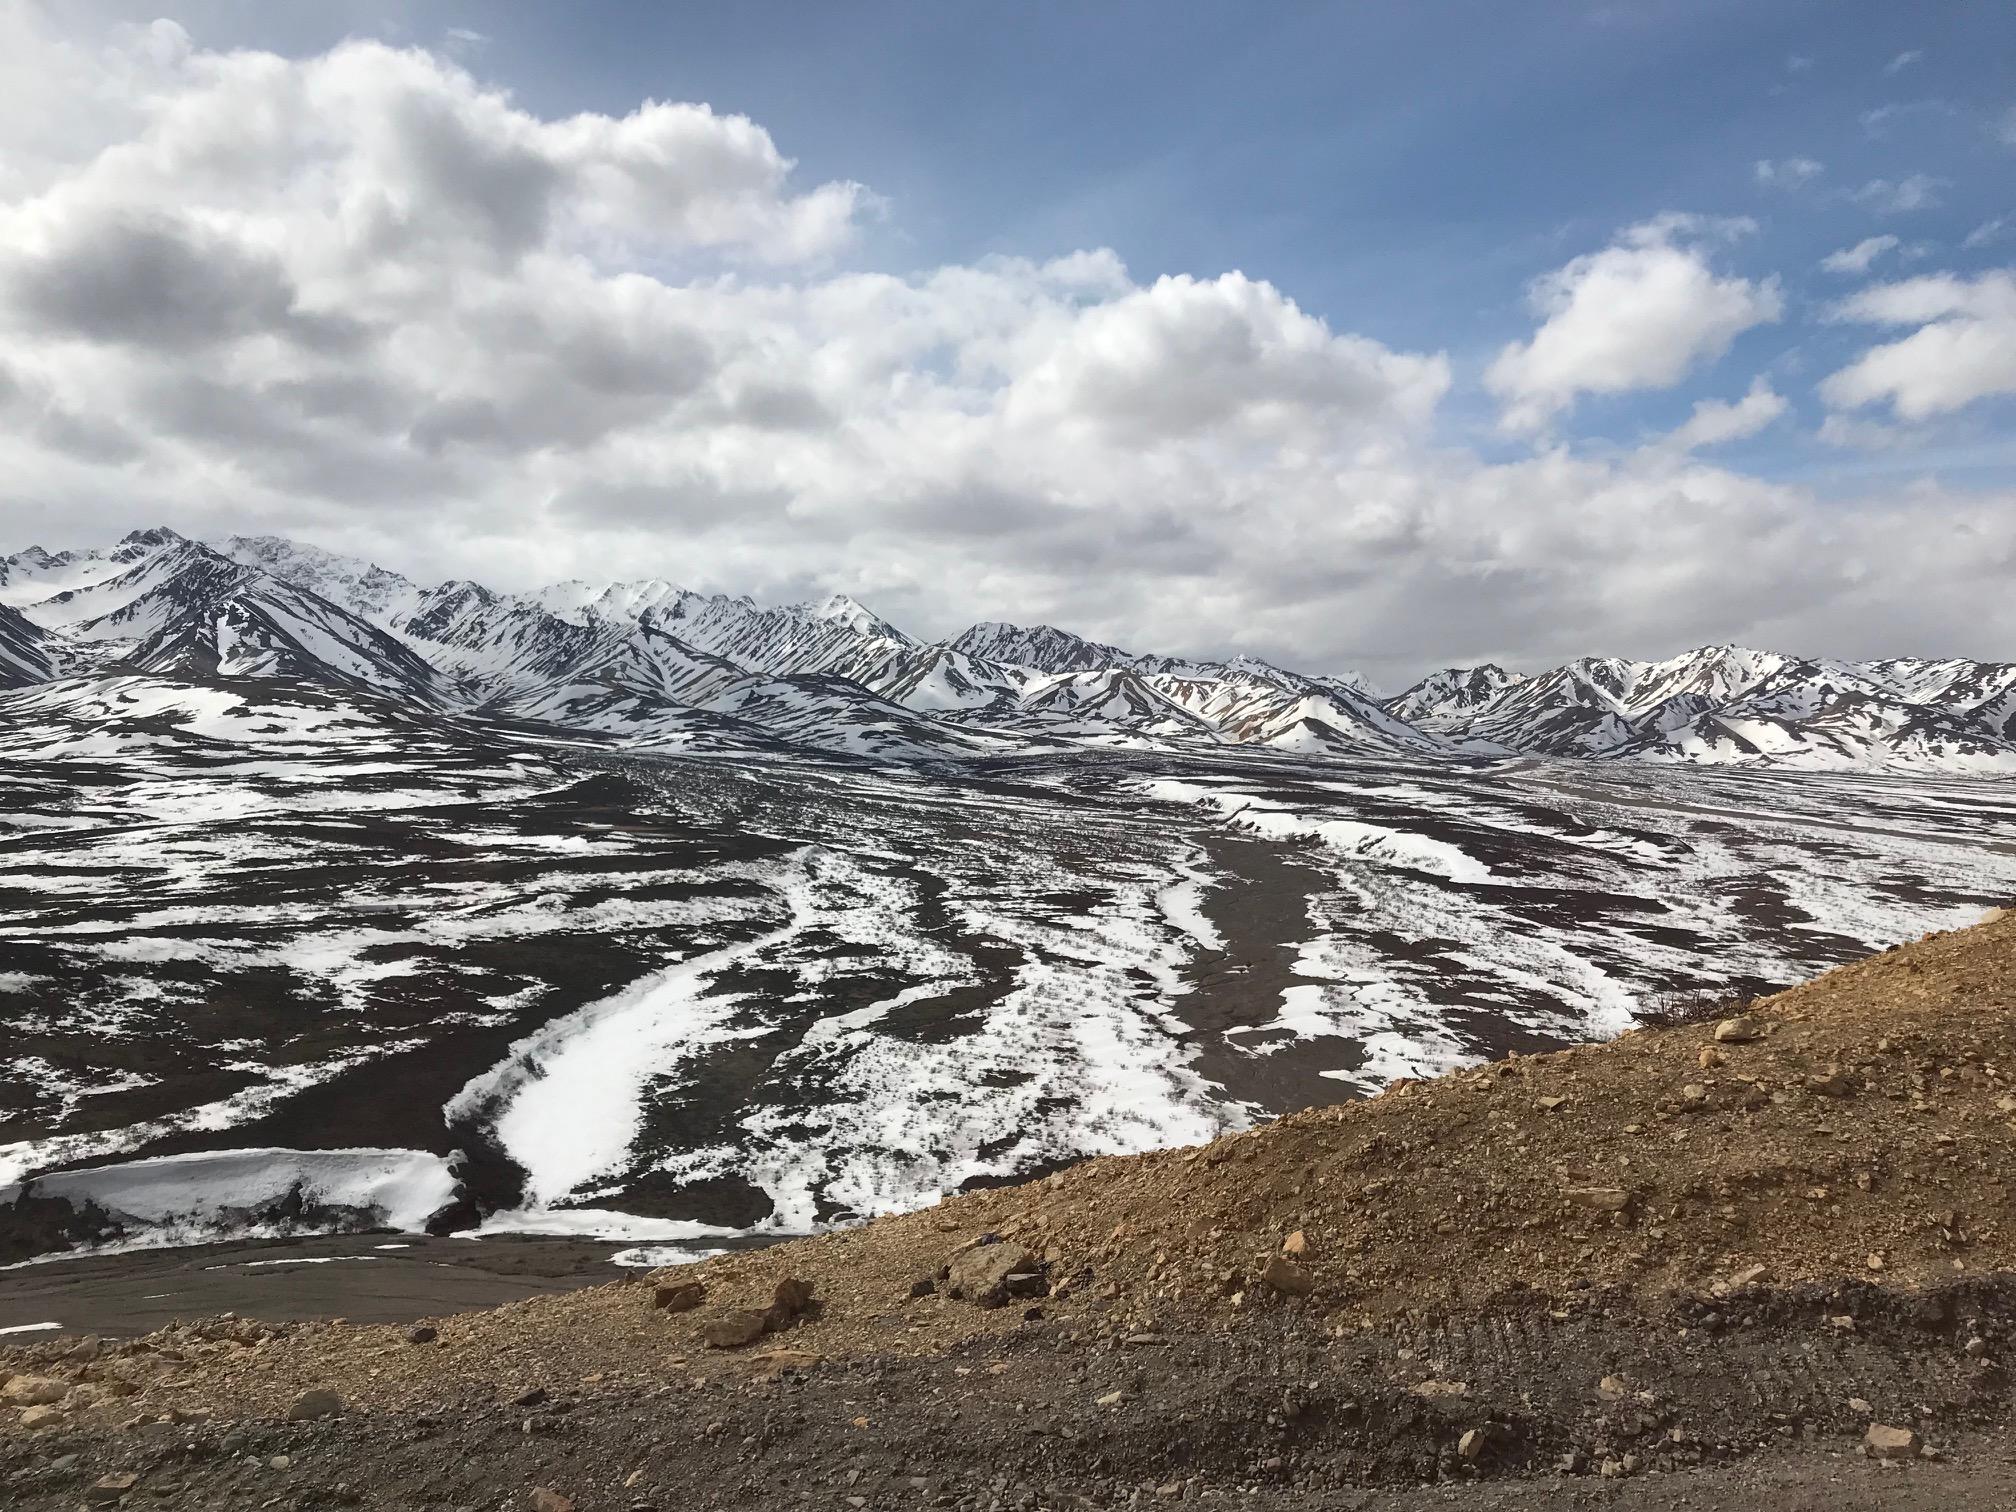 Alaska: State of Superlatives (Part Two) – Everett Potter's